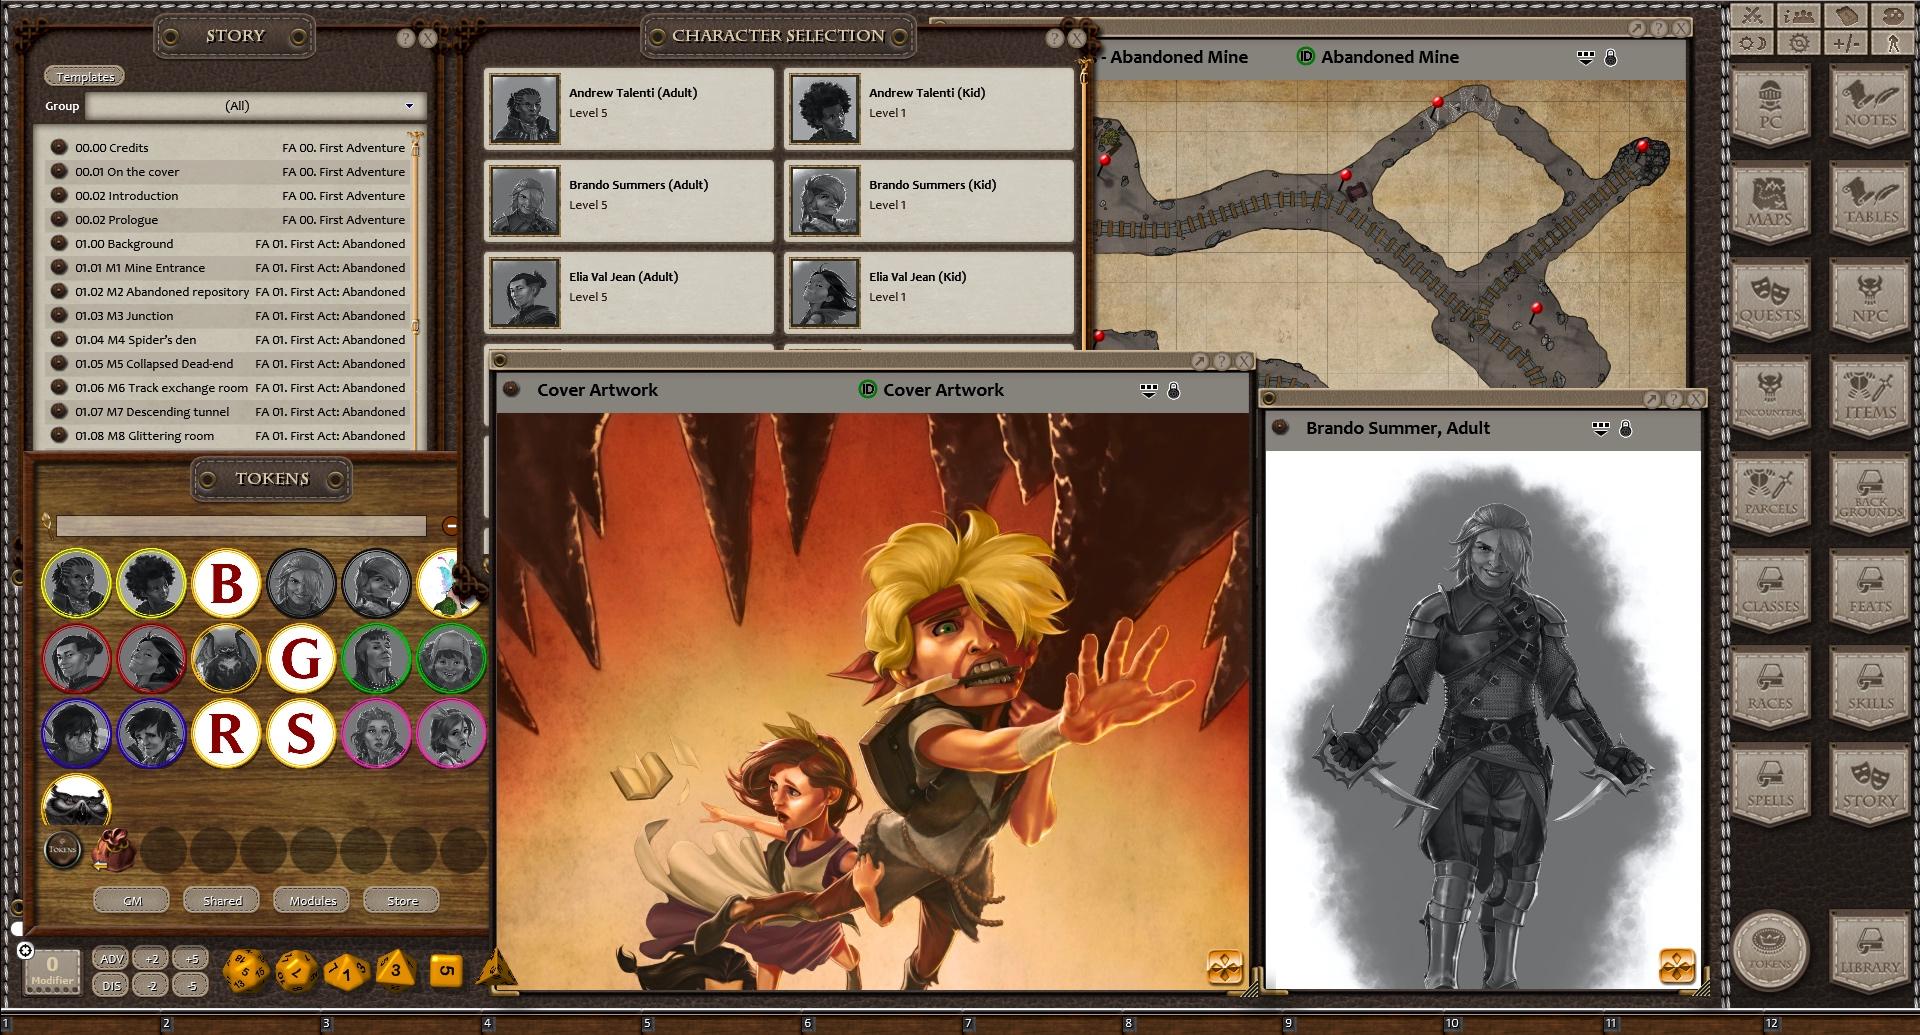 screen_shot_FG_1.jpg